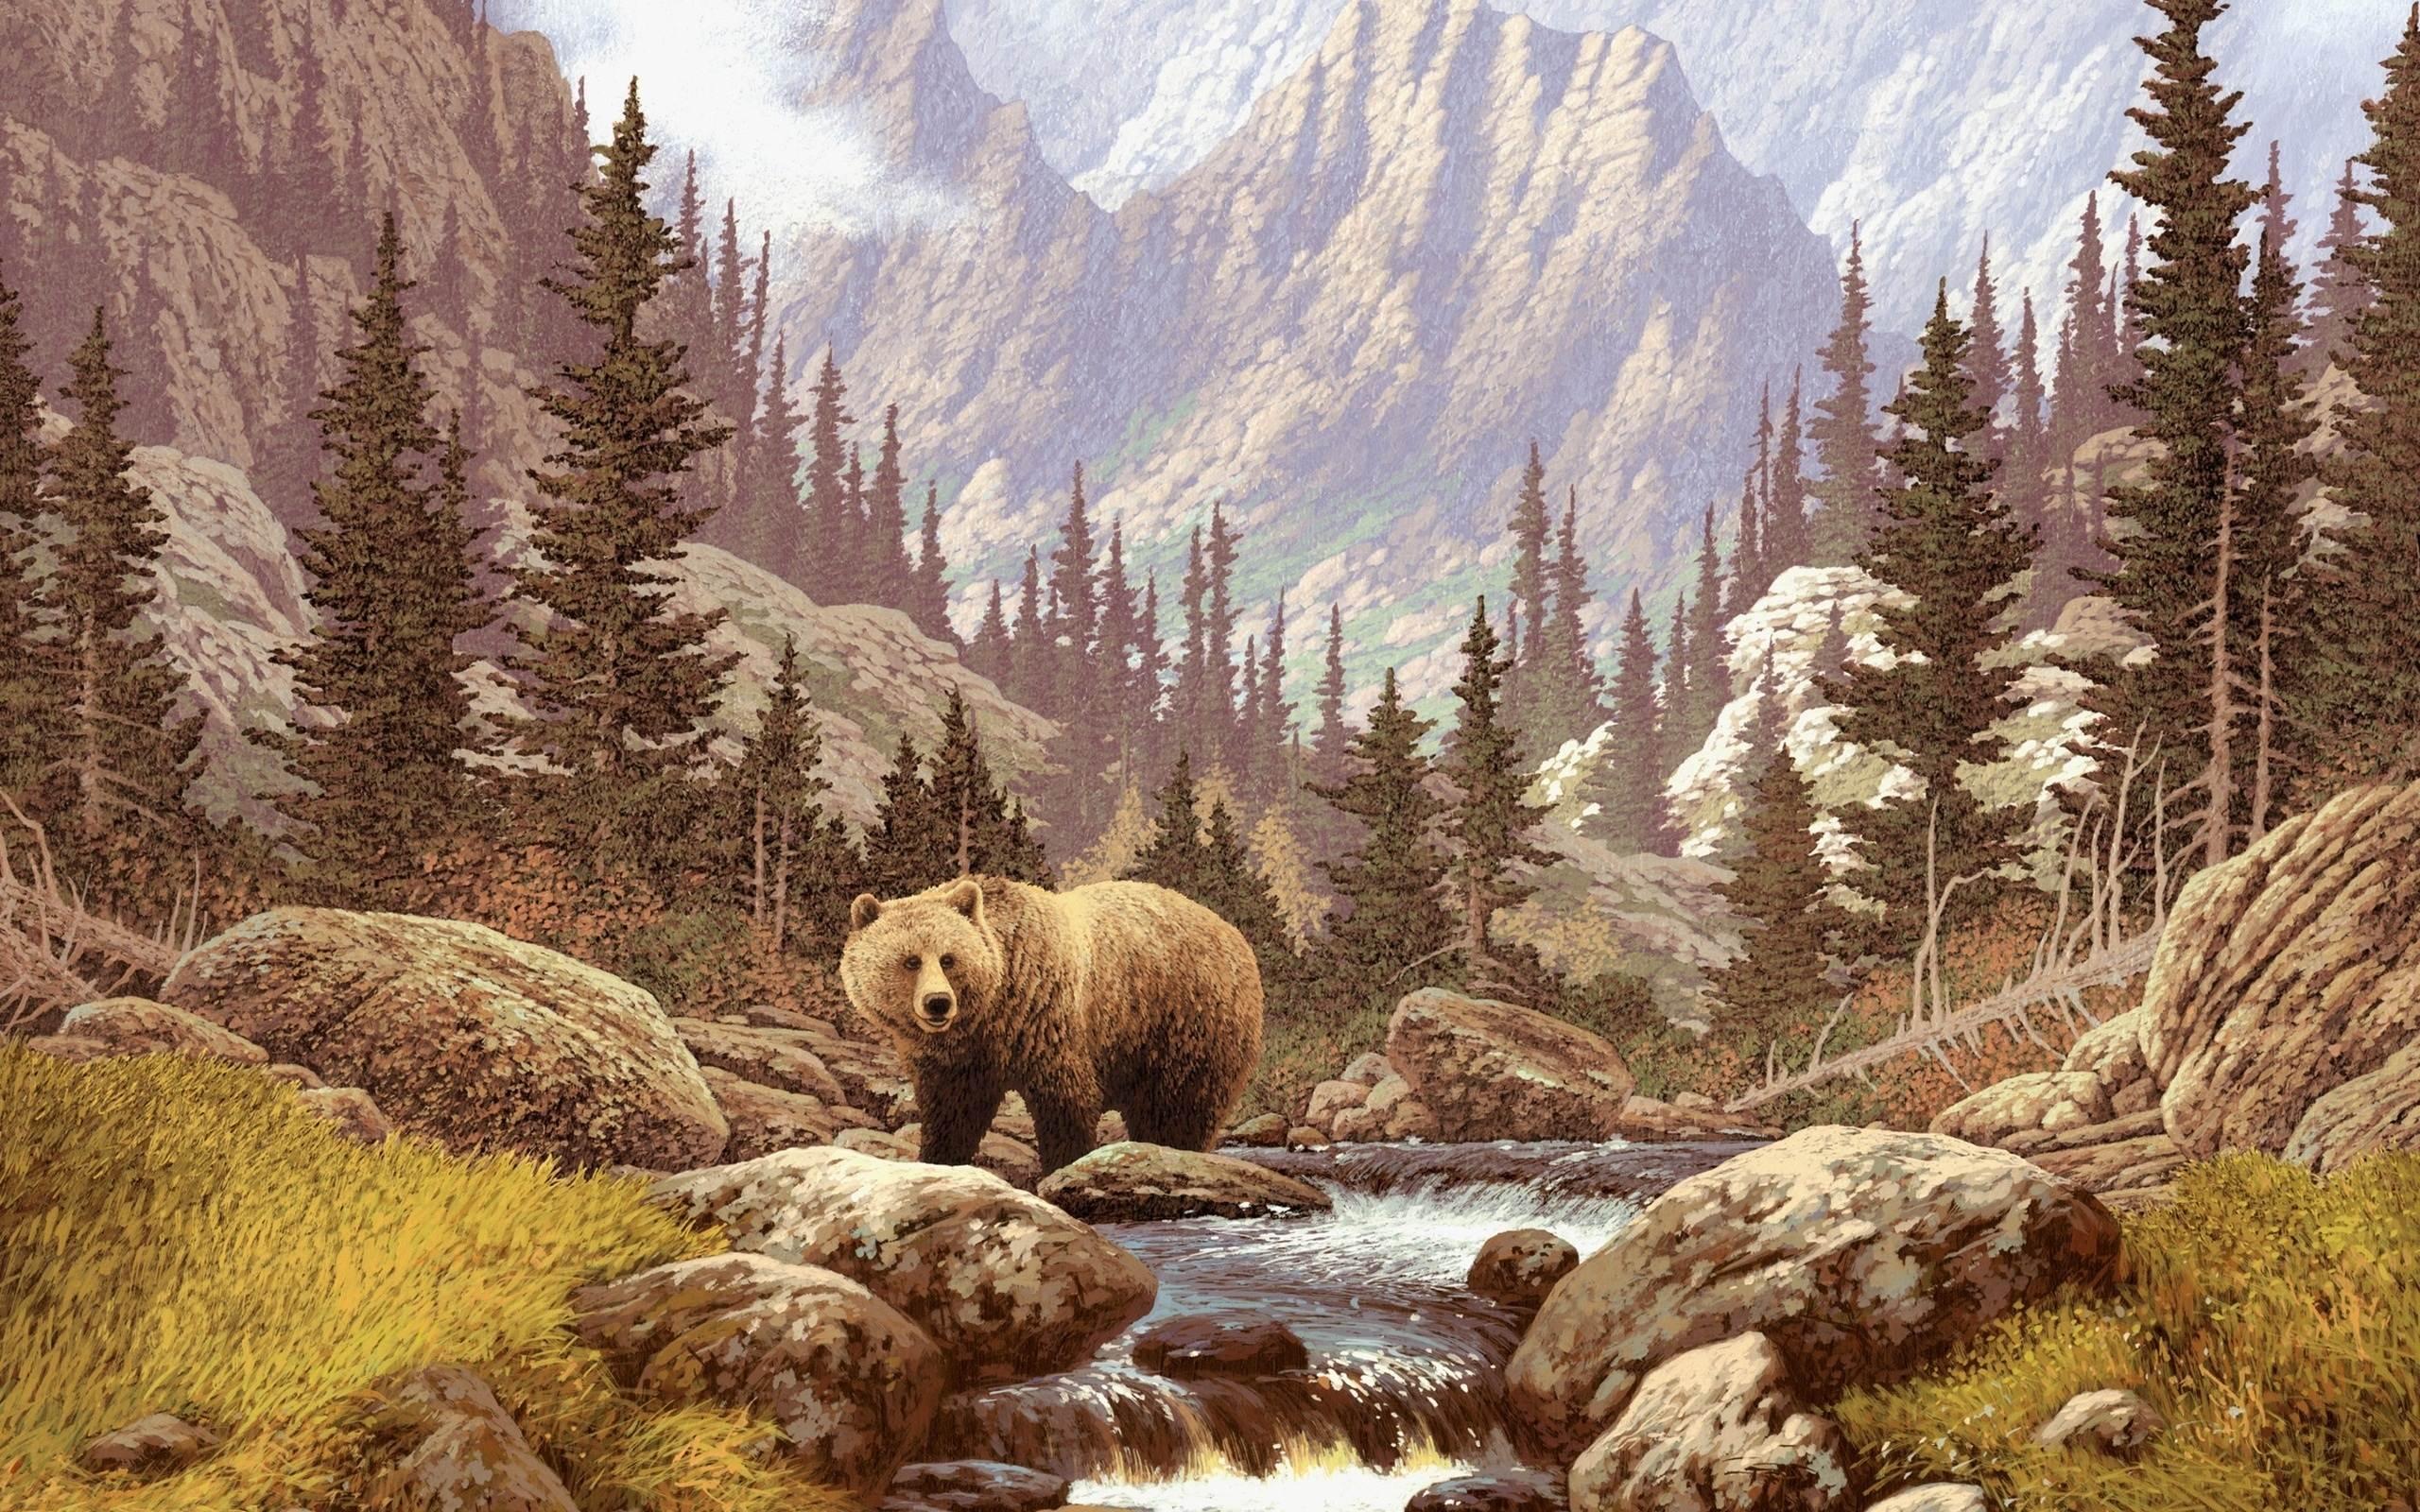 Bear in the Taiga